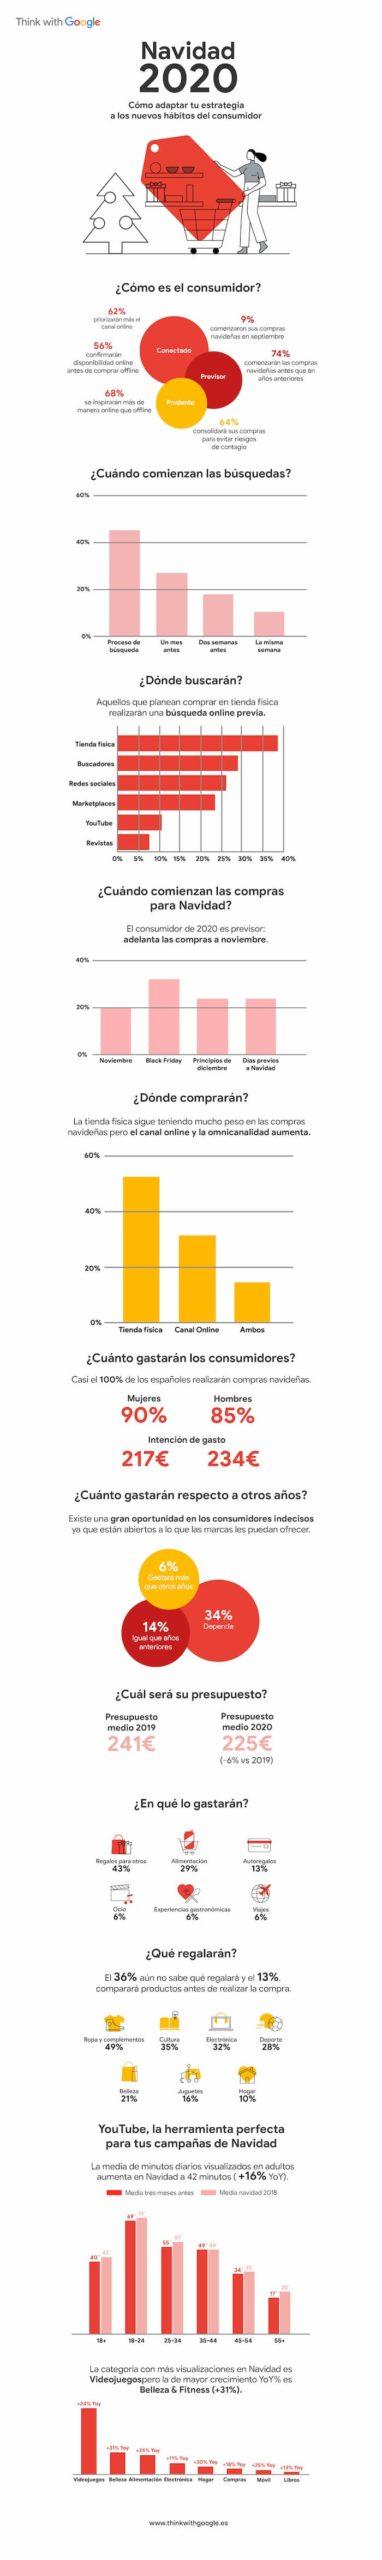 Infografia_Navidad2020 (1)